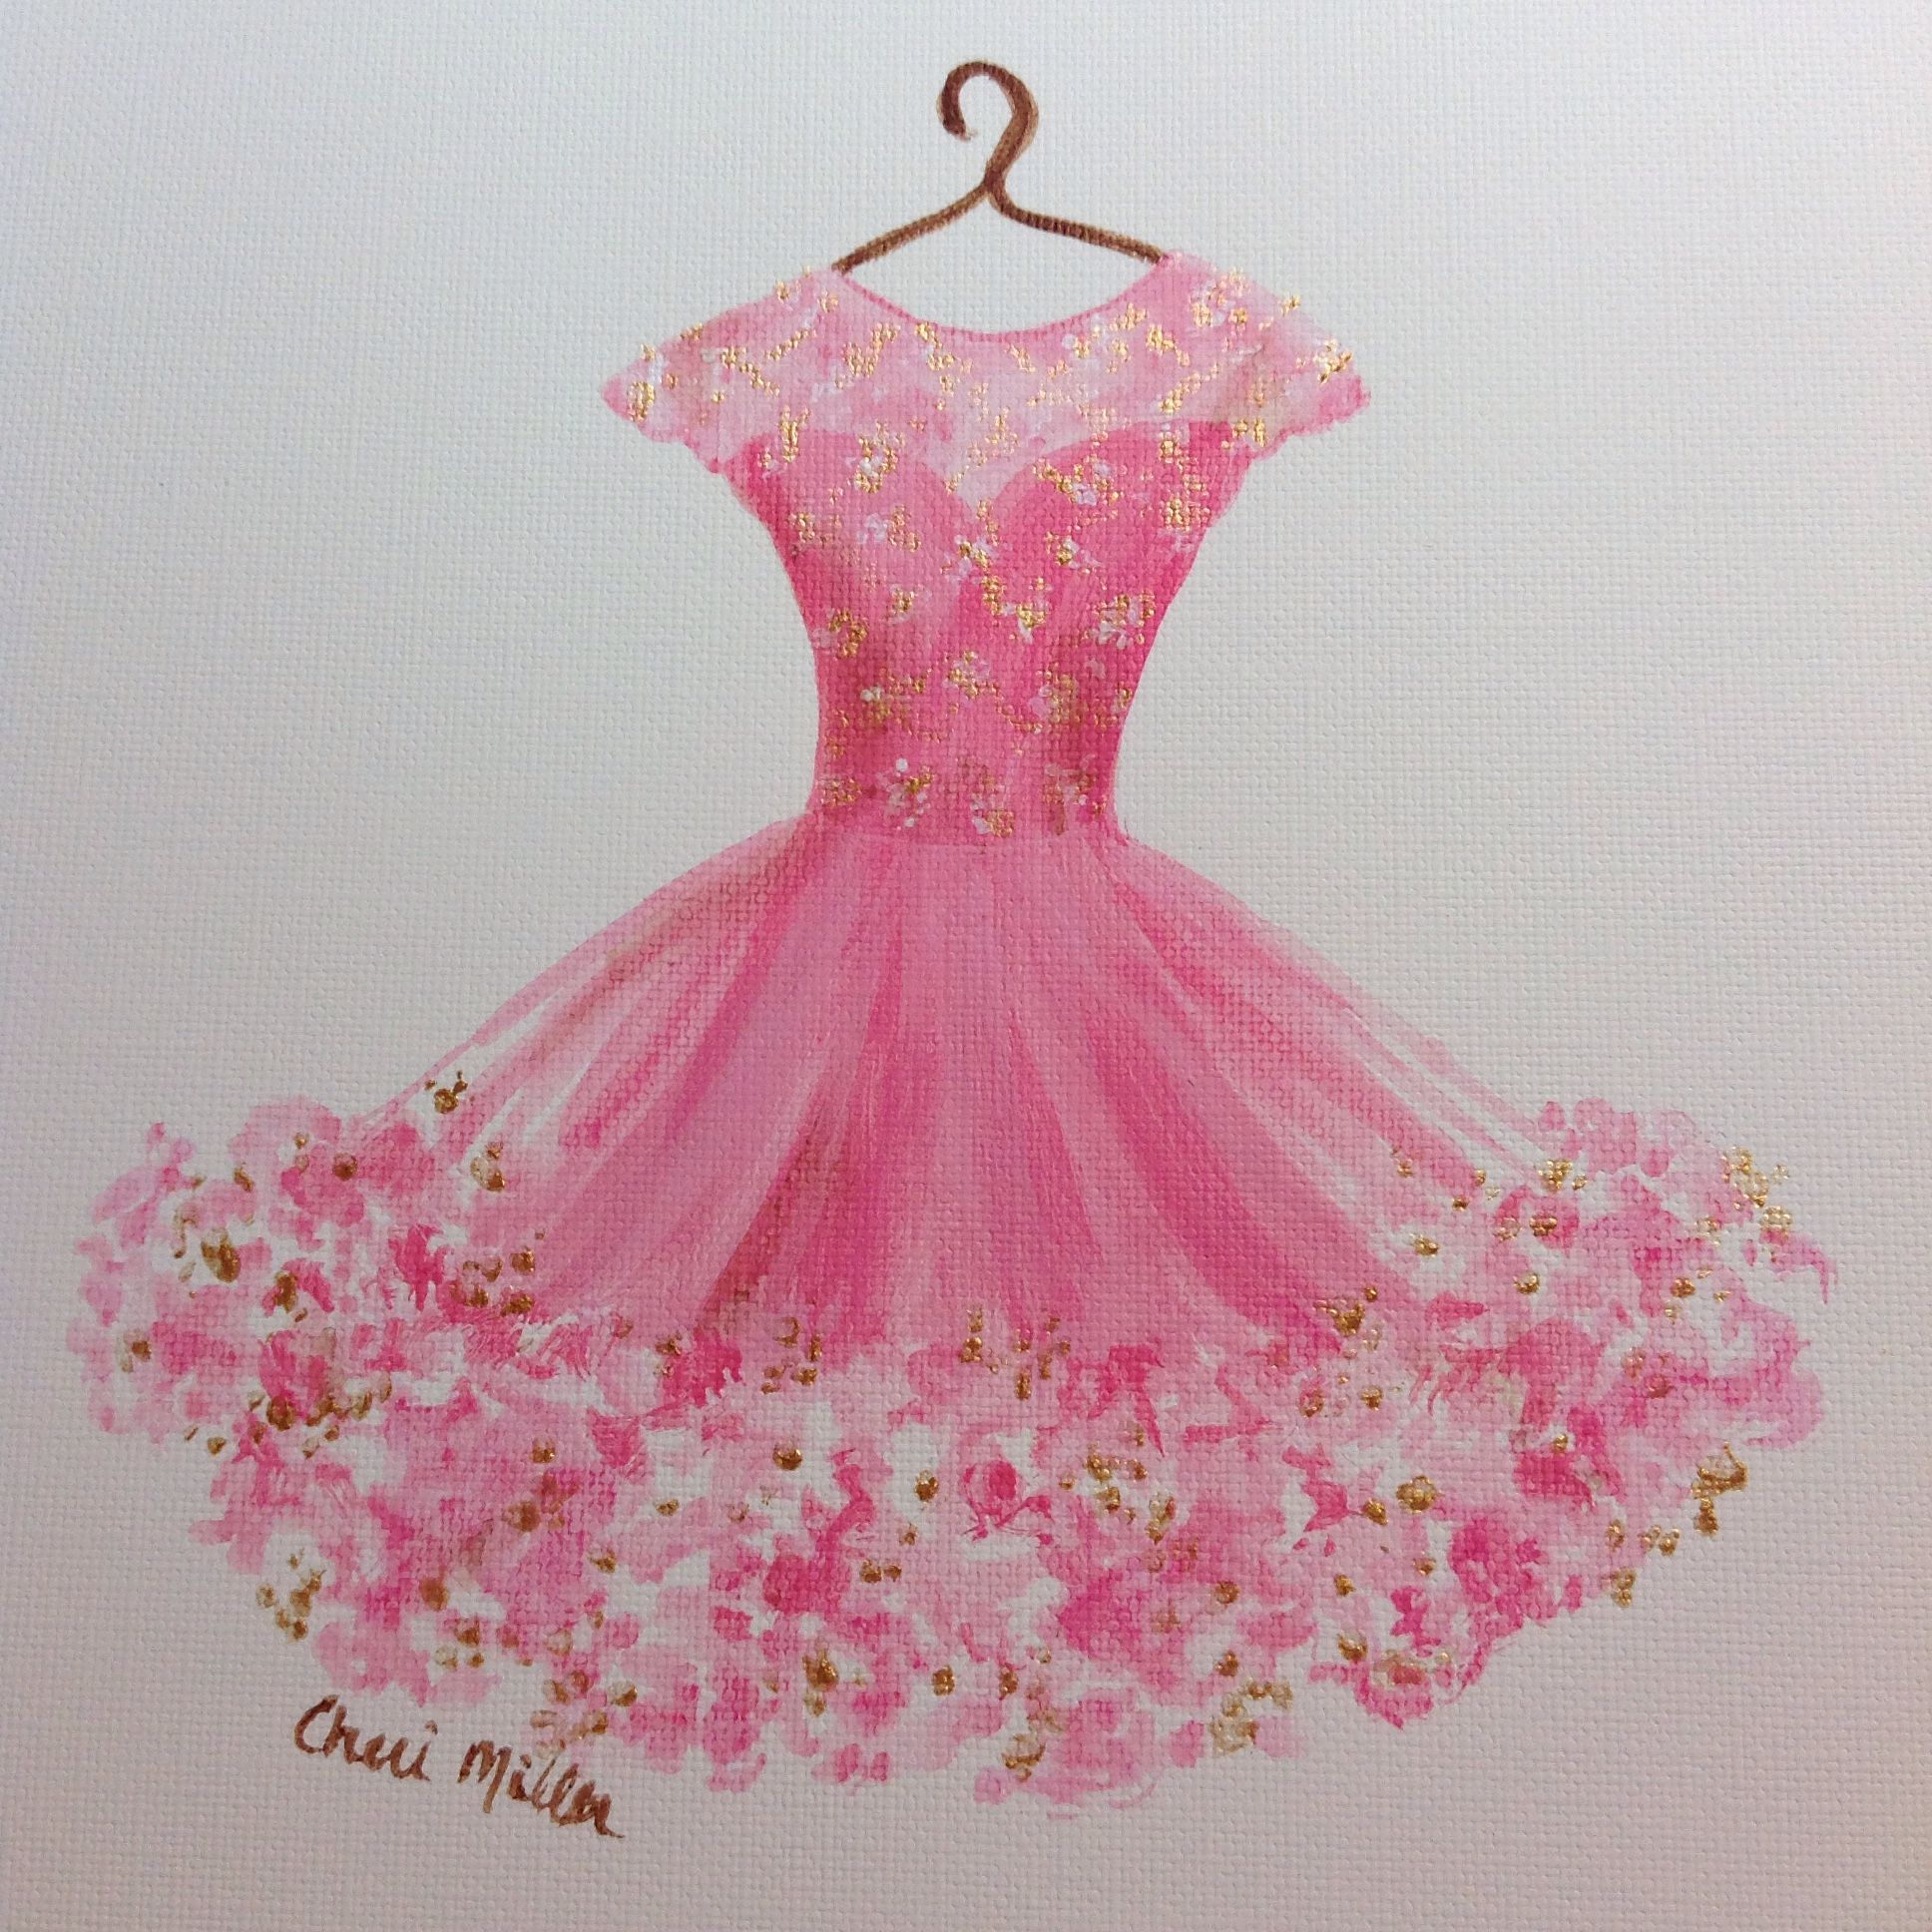 FashionIllustration #Prom Dress #pink #art #pinkdress #CocktailDress ...